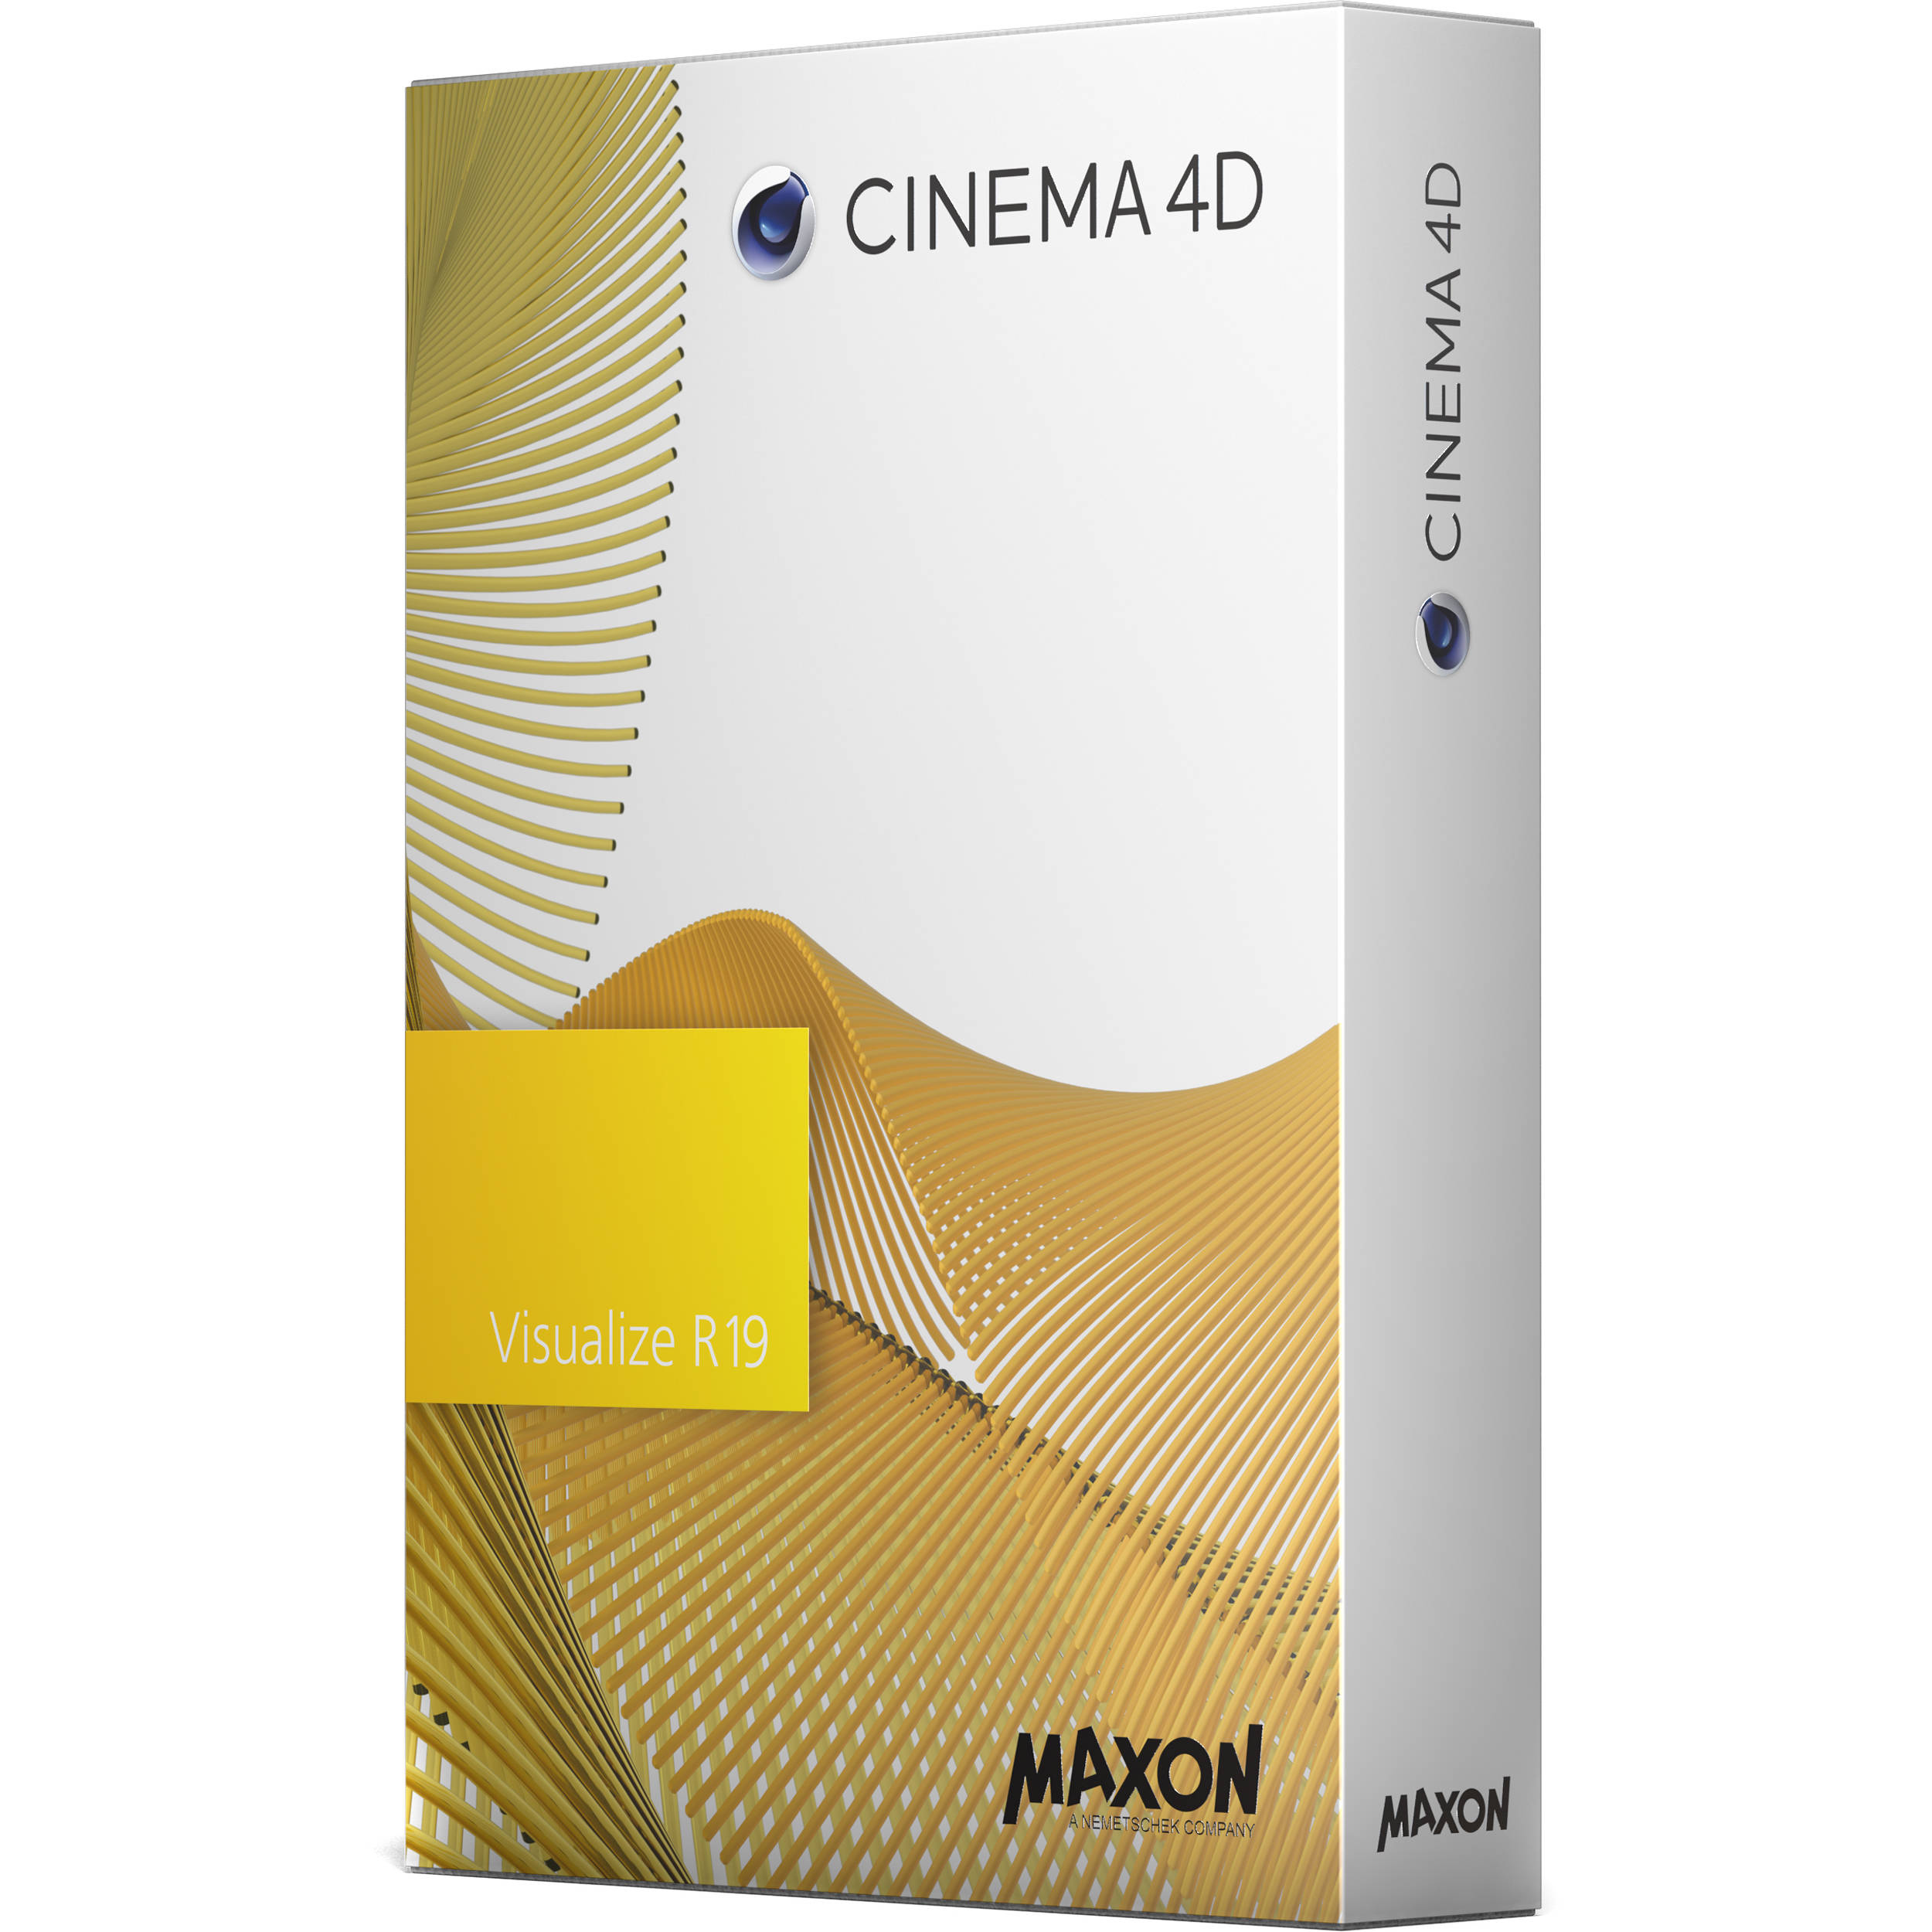 Cinema 4d studio r19 download for pc free.